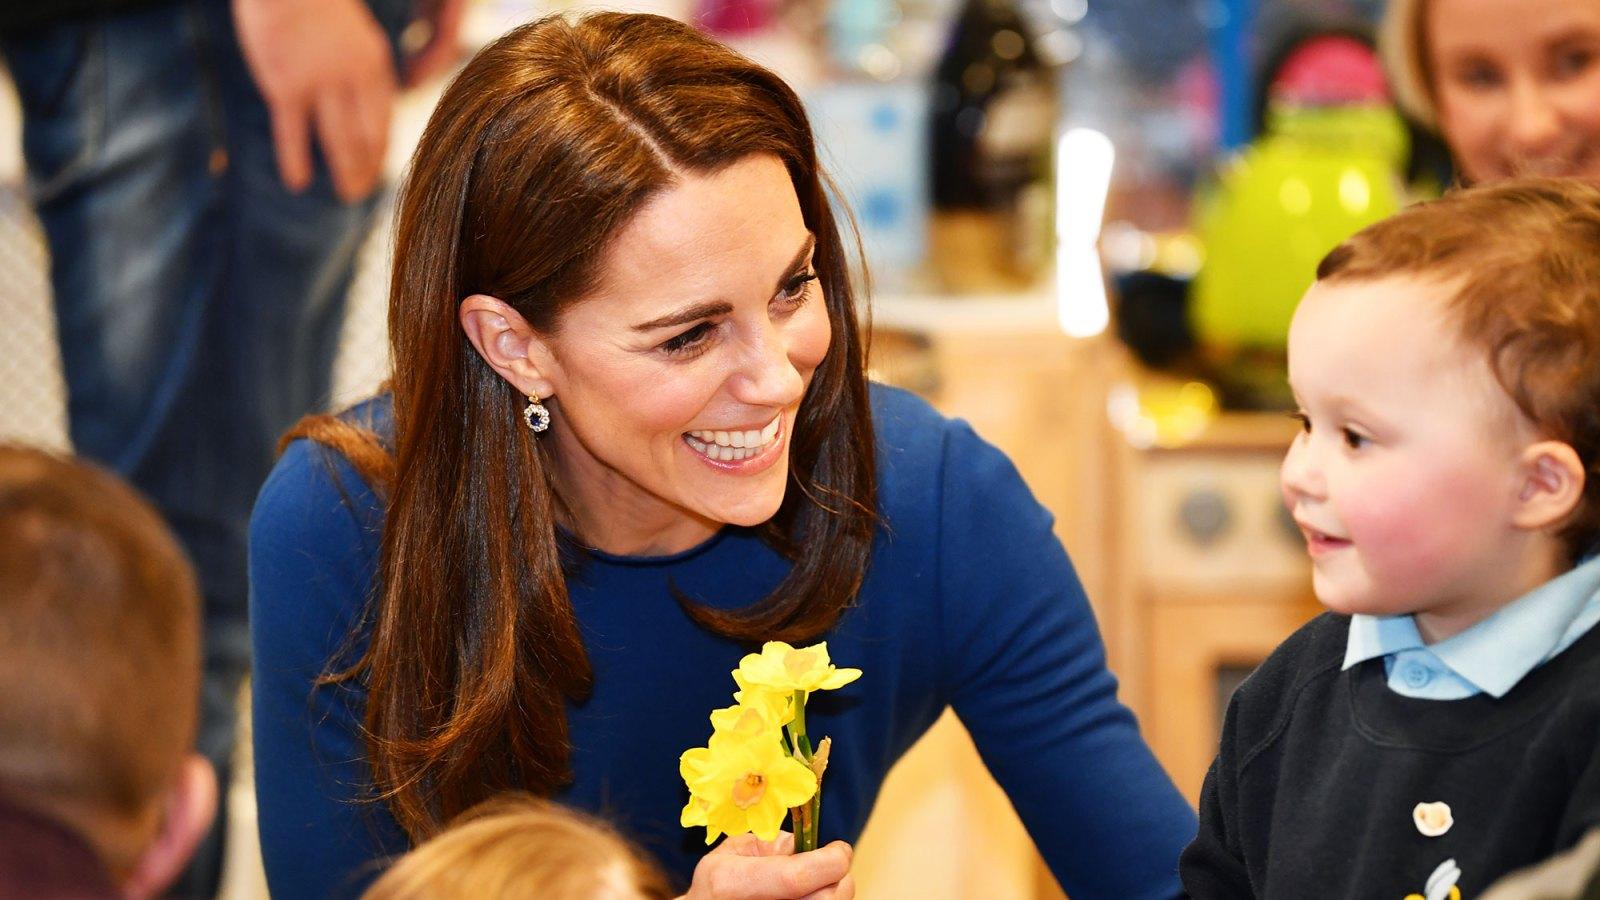 60de5cdd83e01 Kate Middleton Braids Child's Hair in Northern Ireland: Video